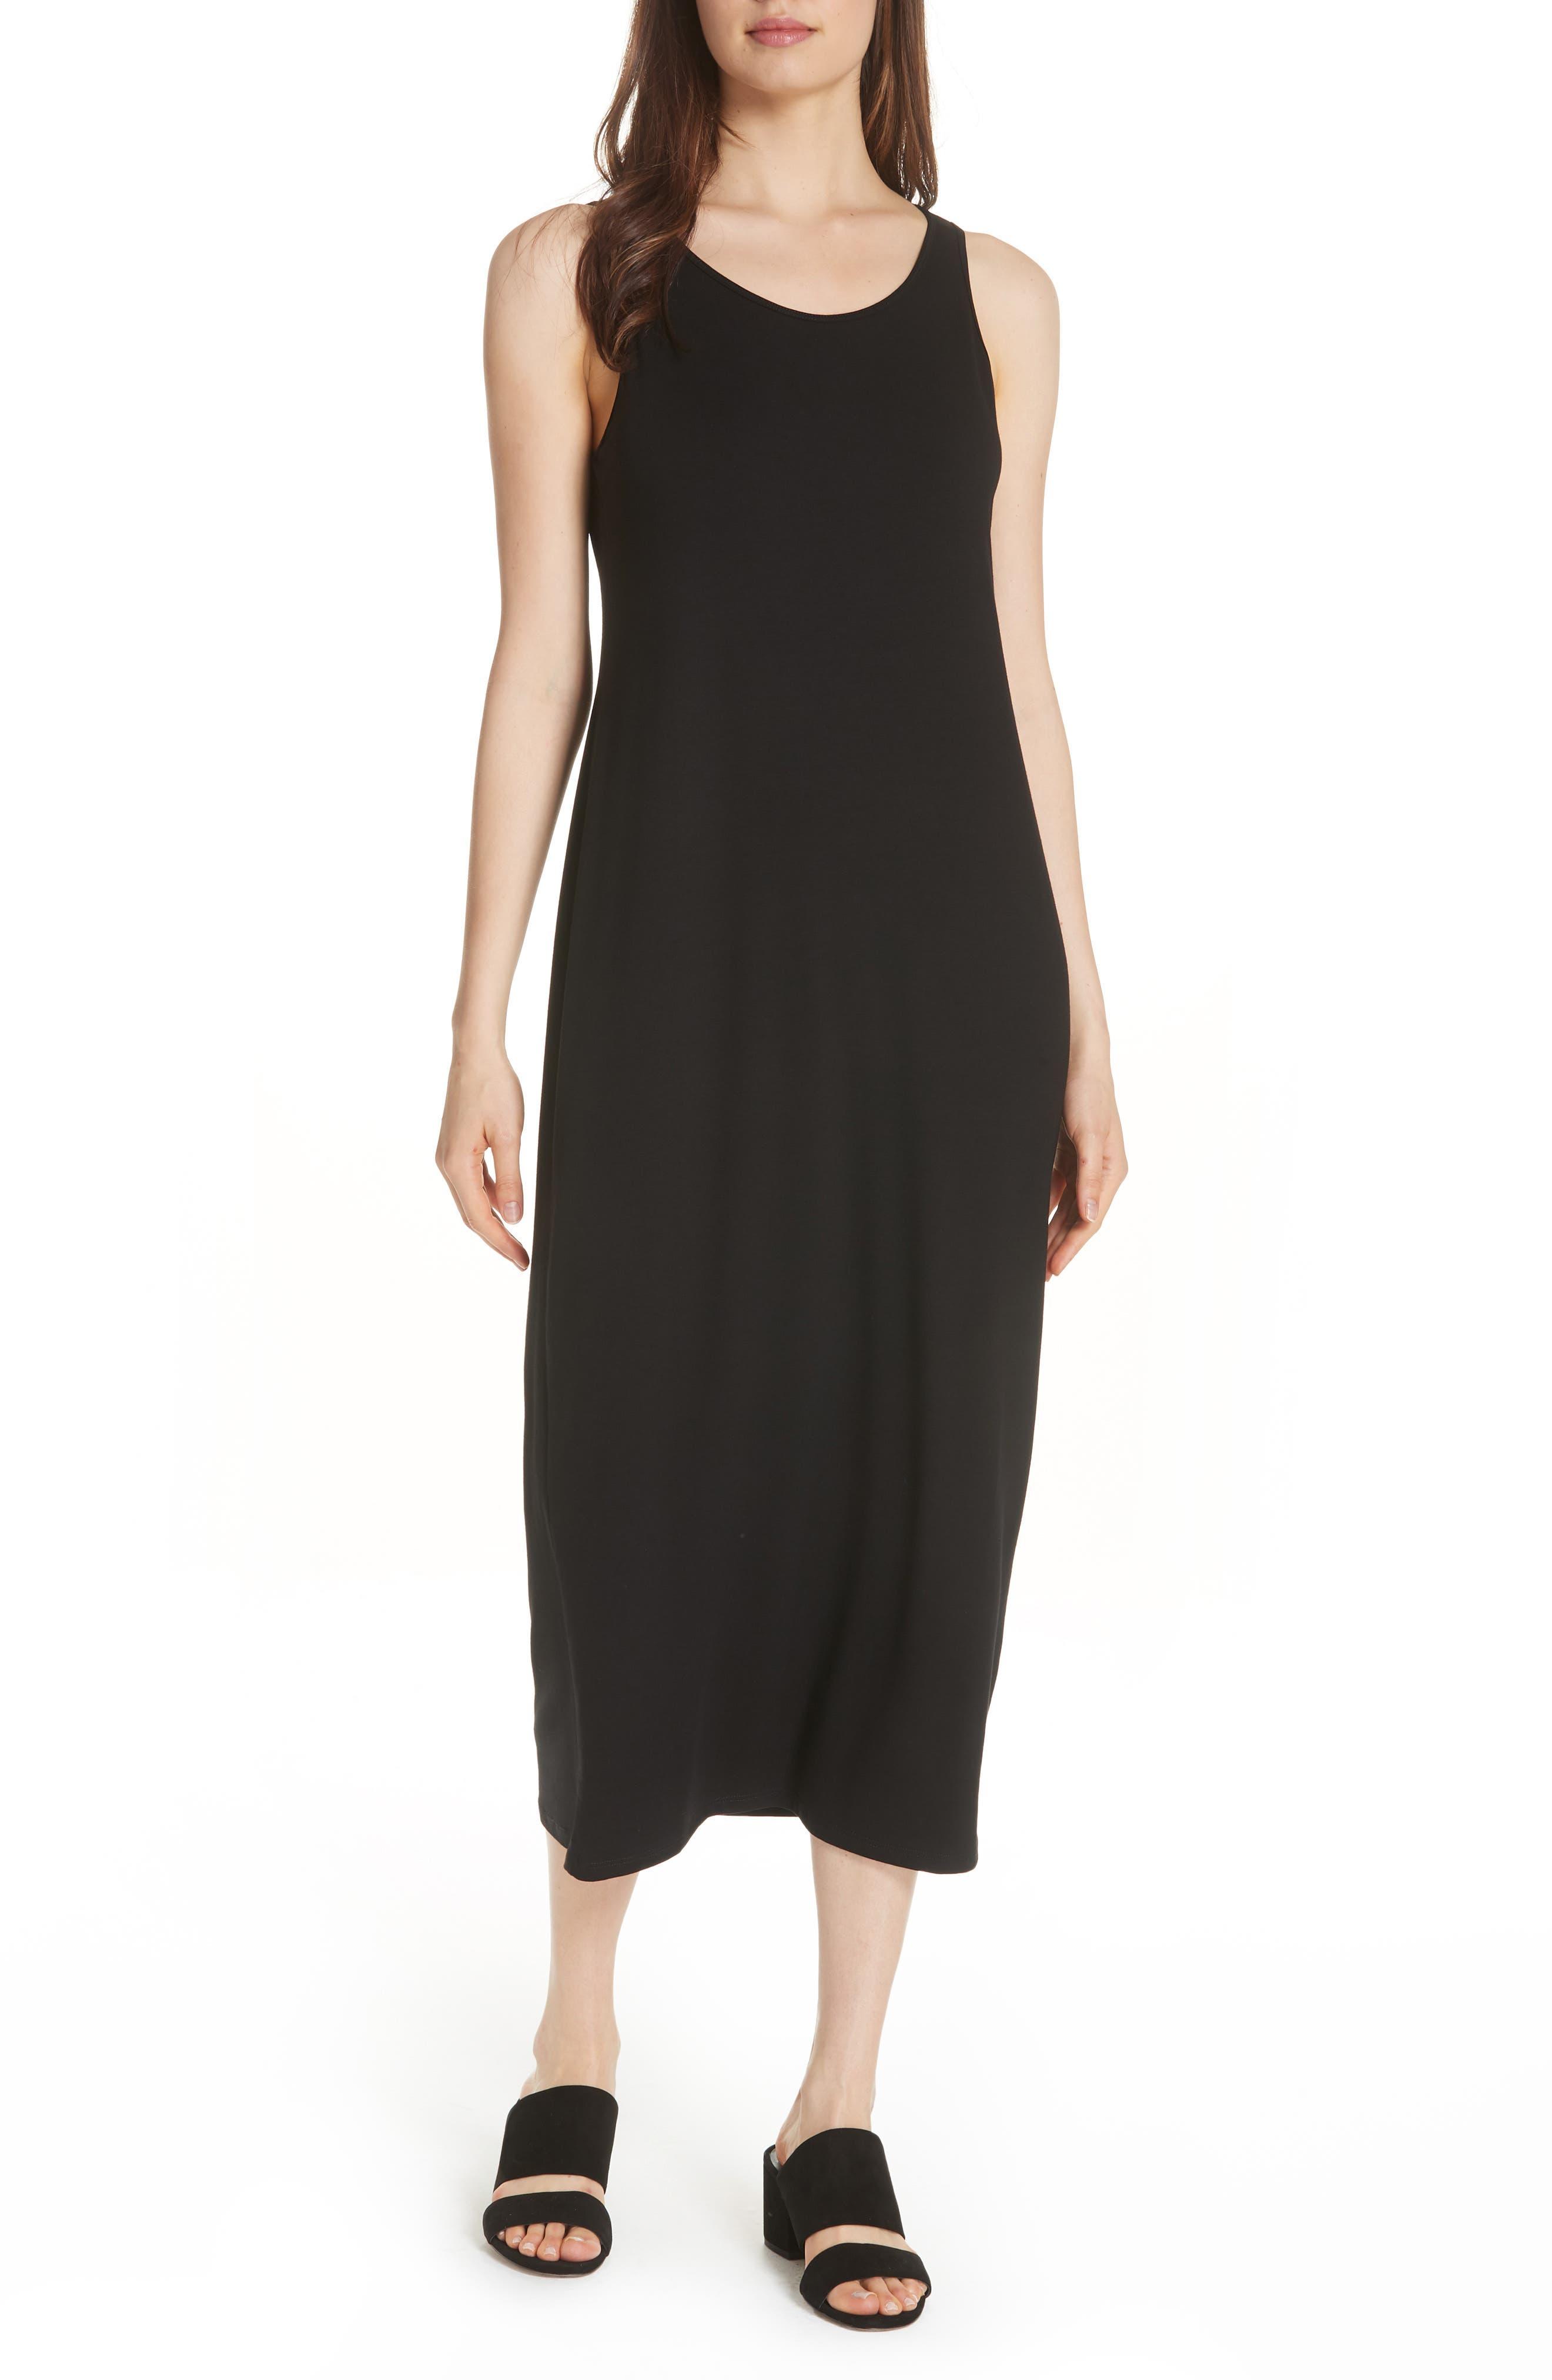 EILEEN FISHER Midi Tank Dress, Main, color, BLACK